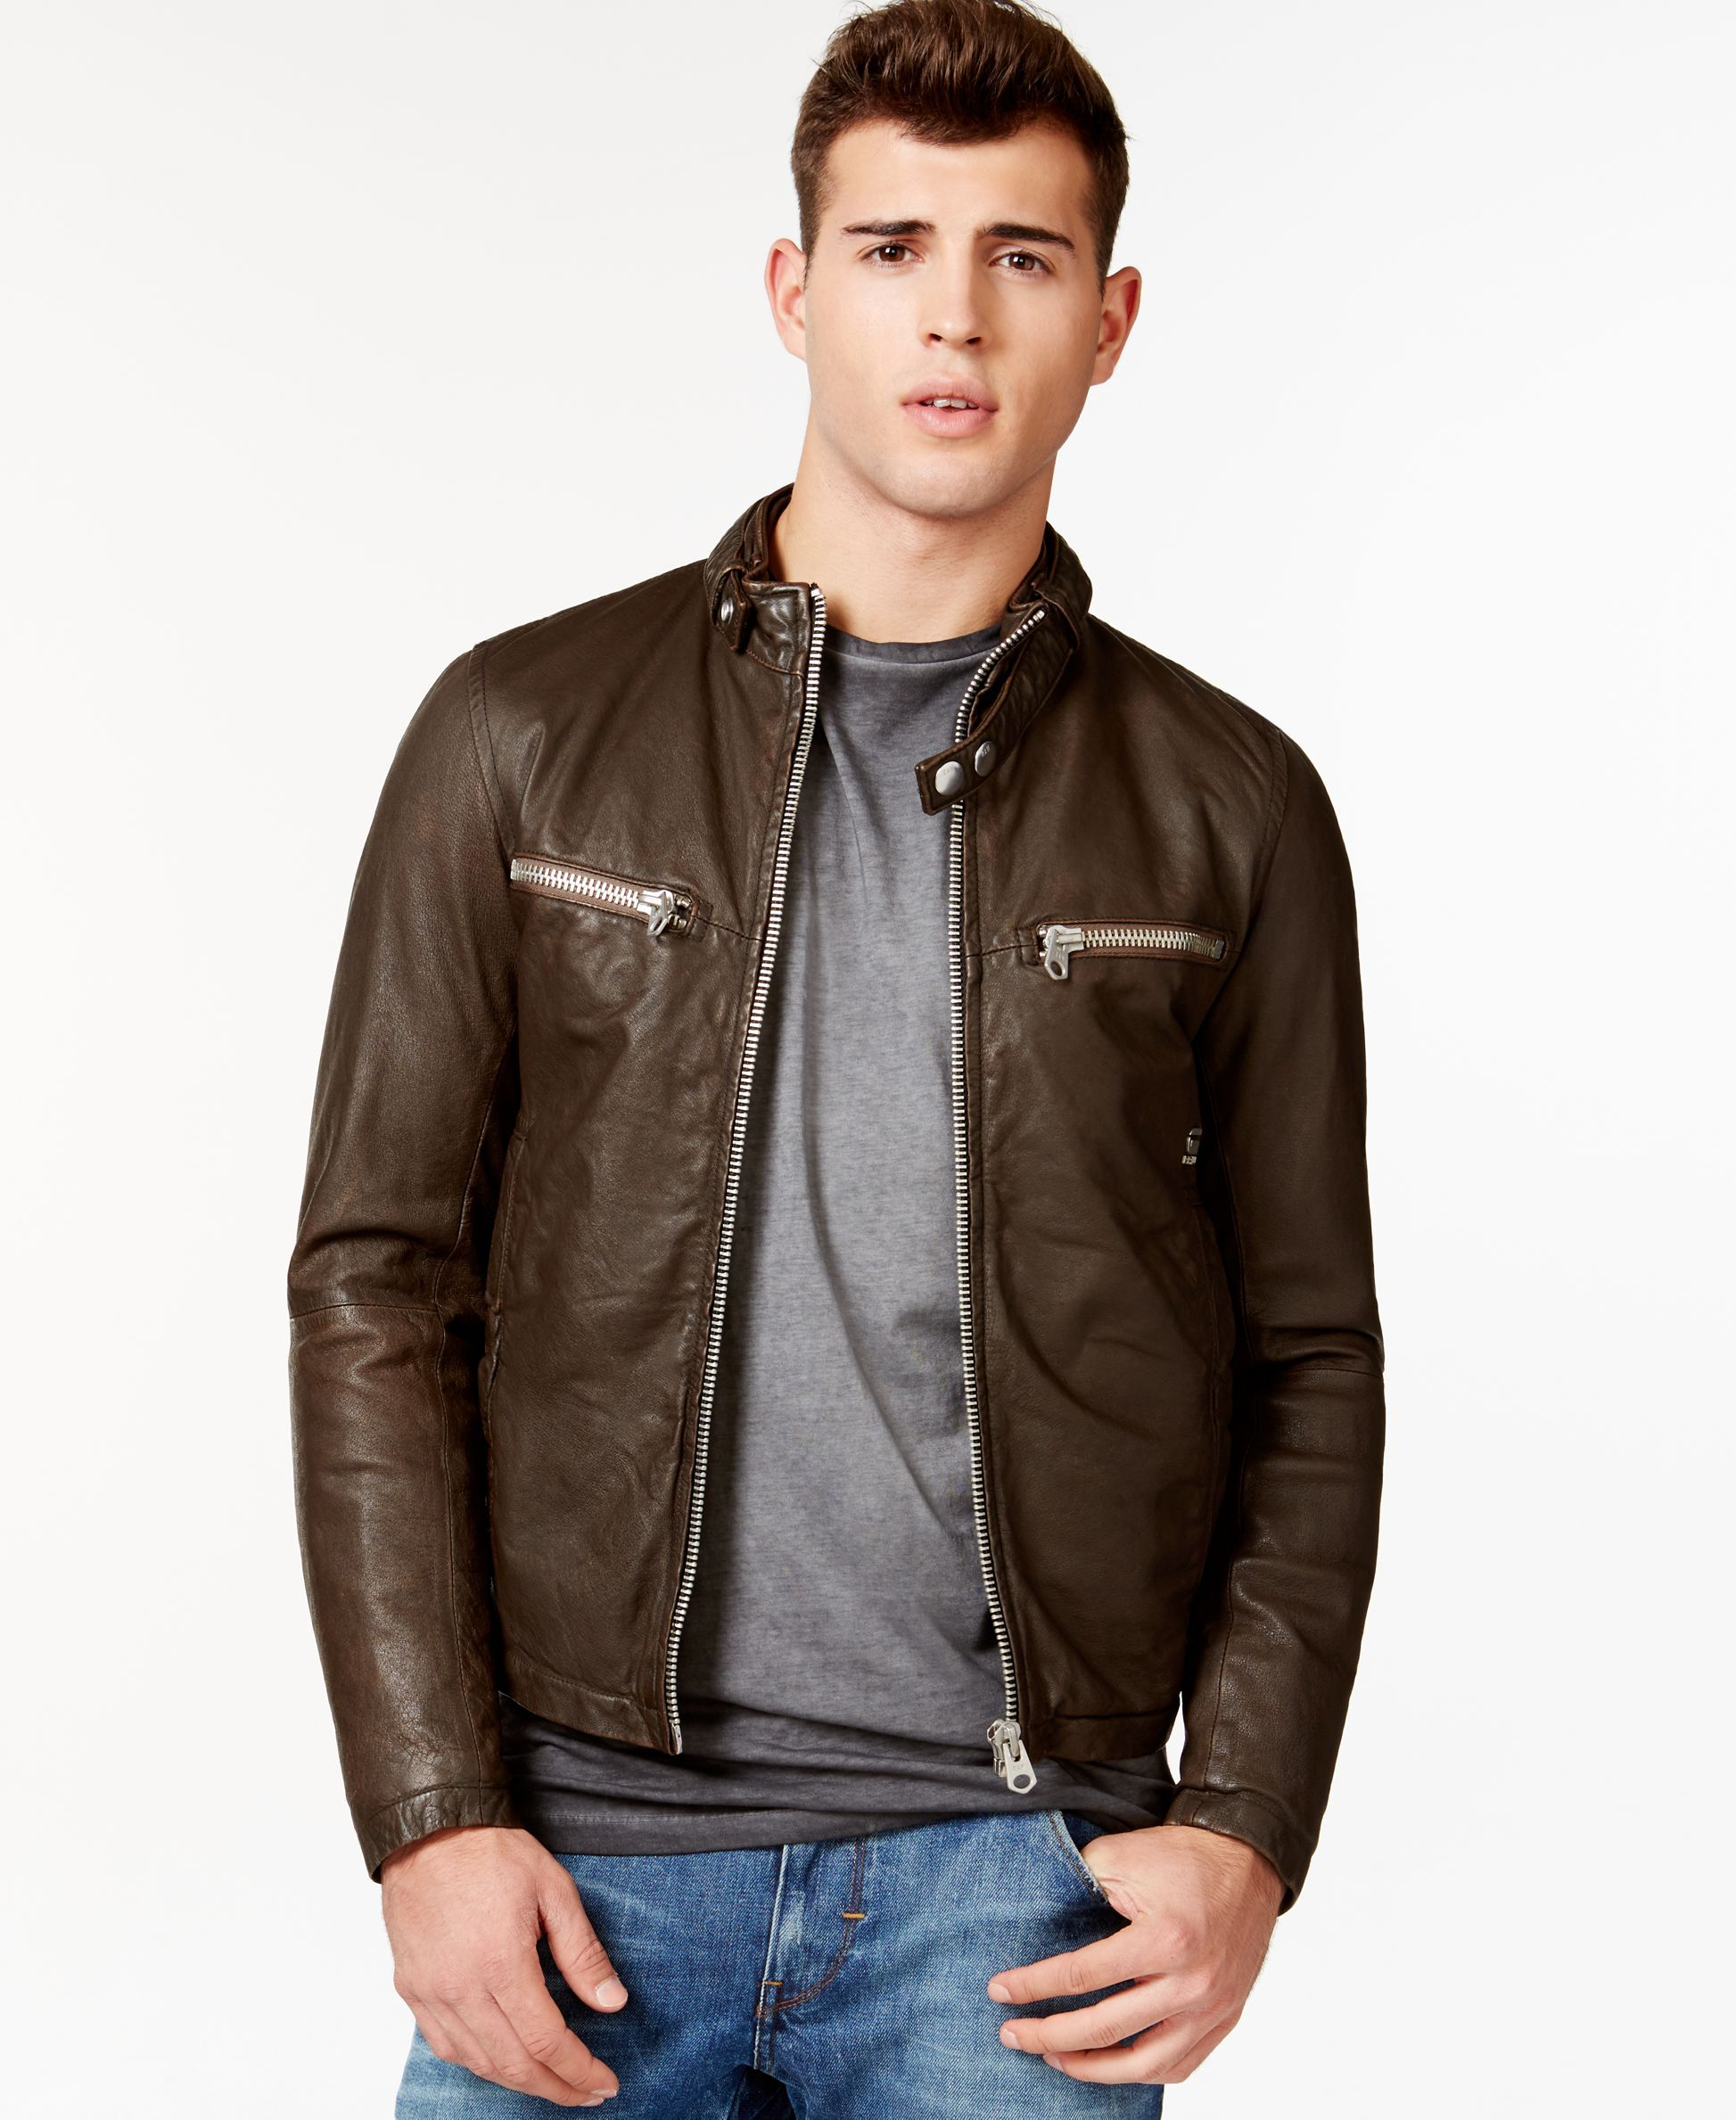 G Star Raw Engine Leather Jacket Leather Jacket Jackets Leather Jackets Online [ 2378 x 1947 Pixel ]